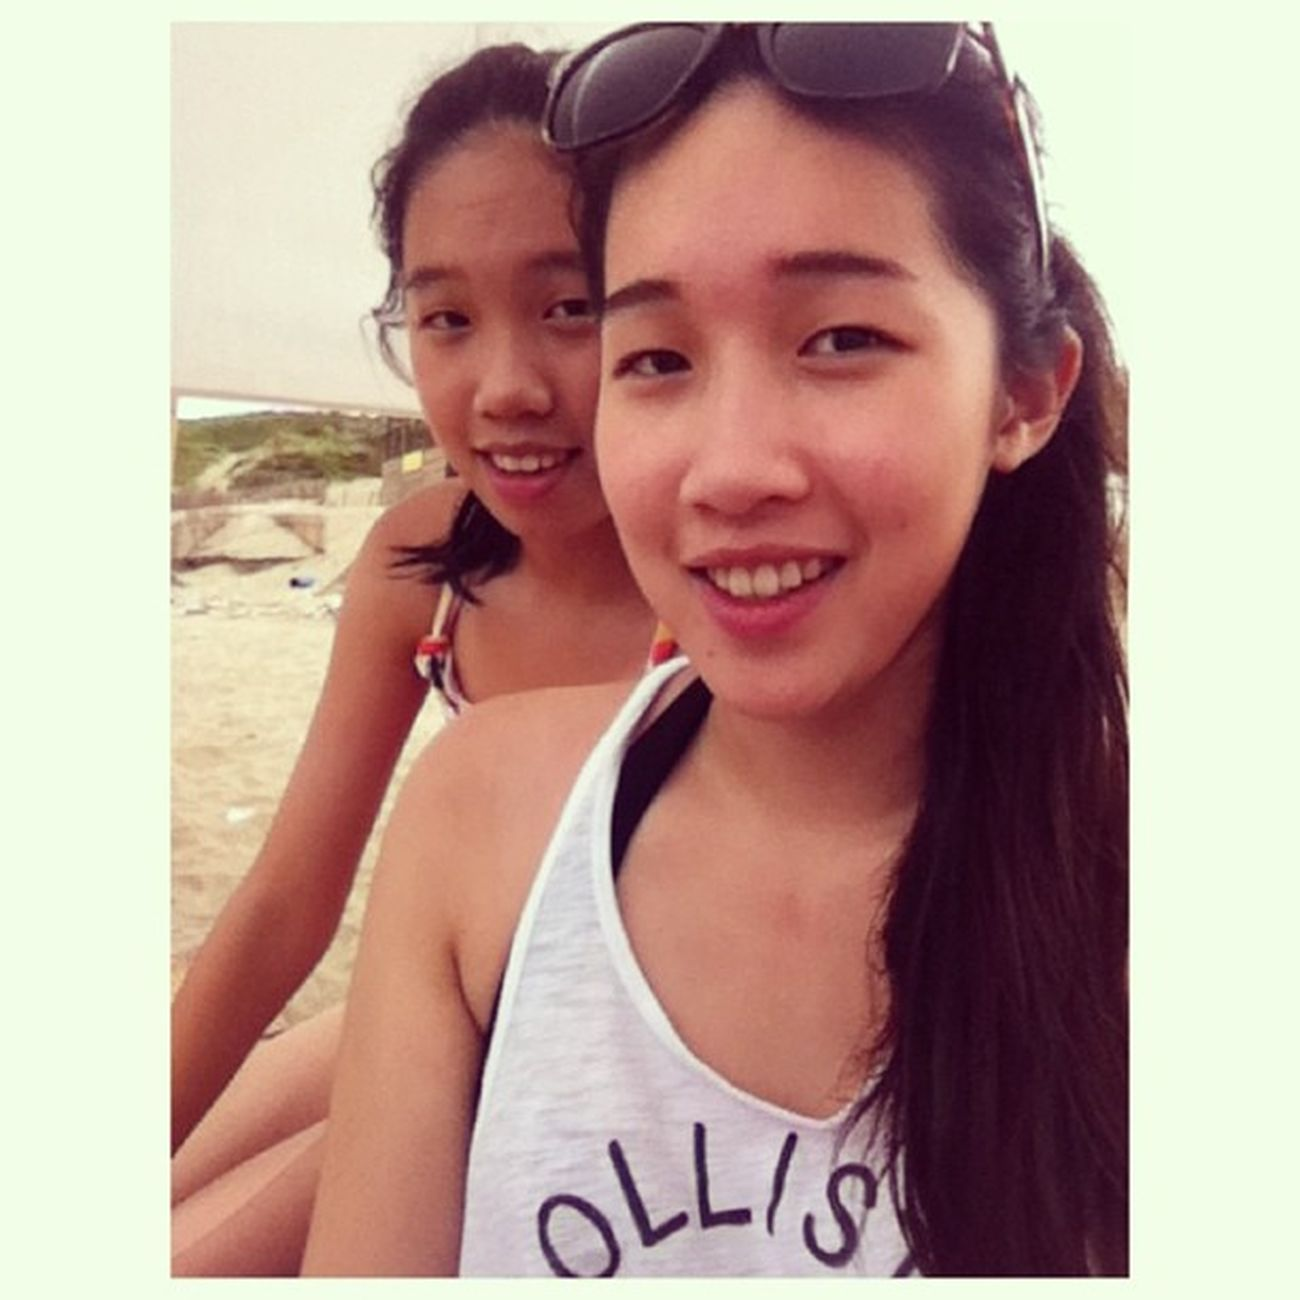 We're summer kinda girls☀? Summergirls Thisissummer Beachtimefun Instabeach instadaily instasummer